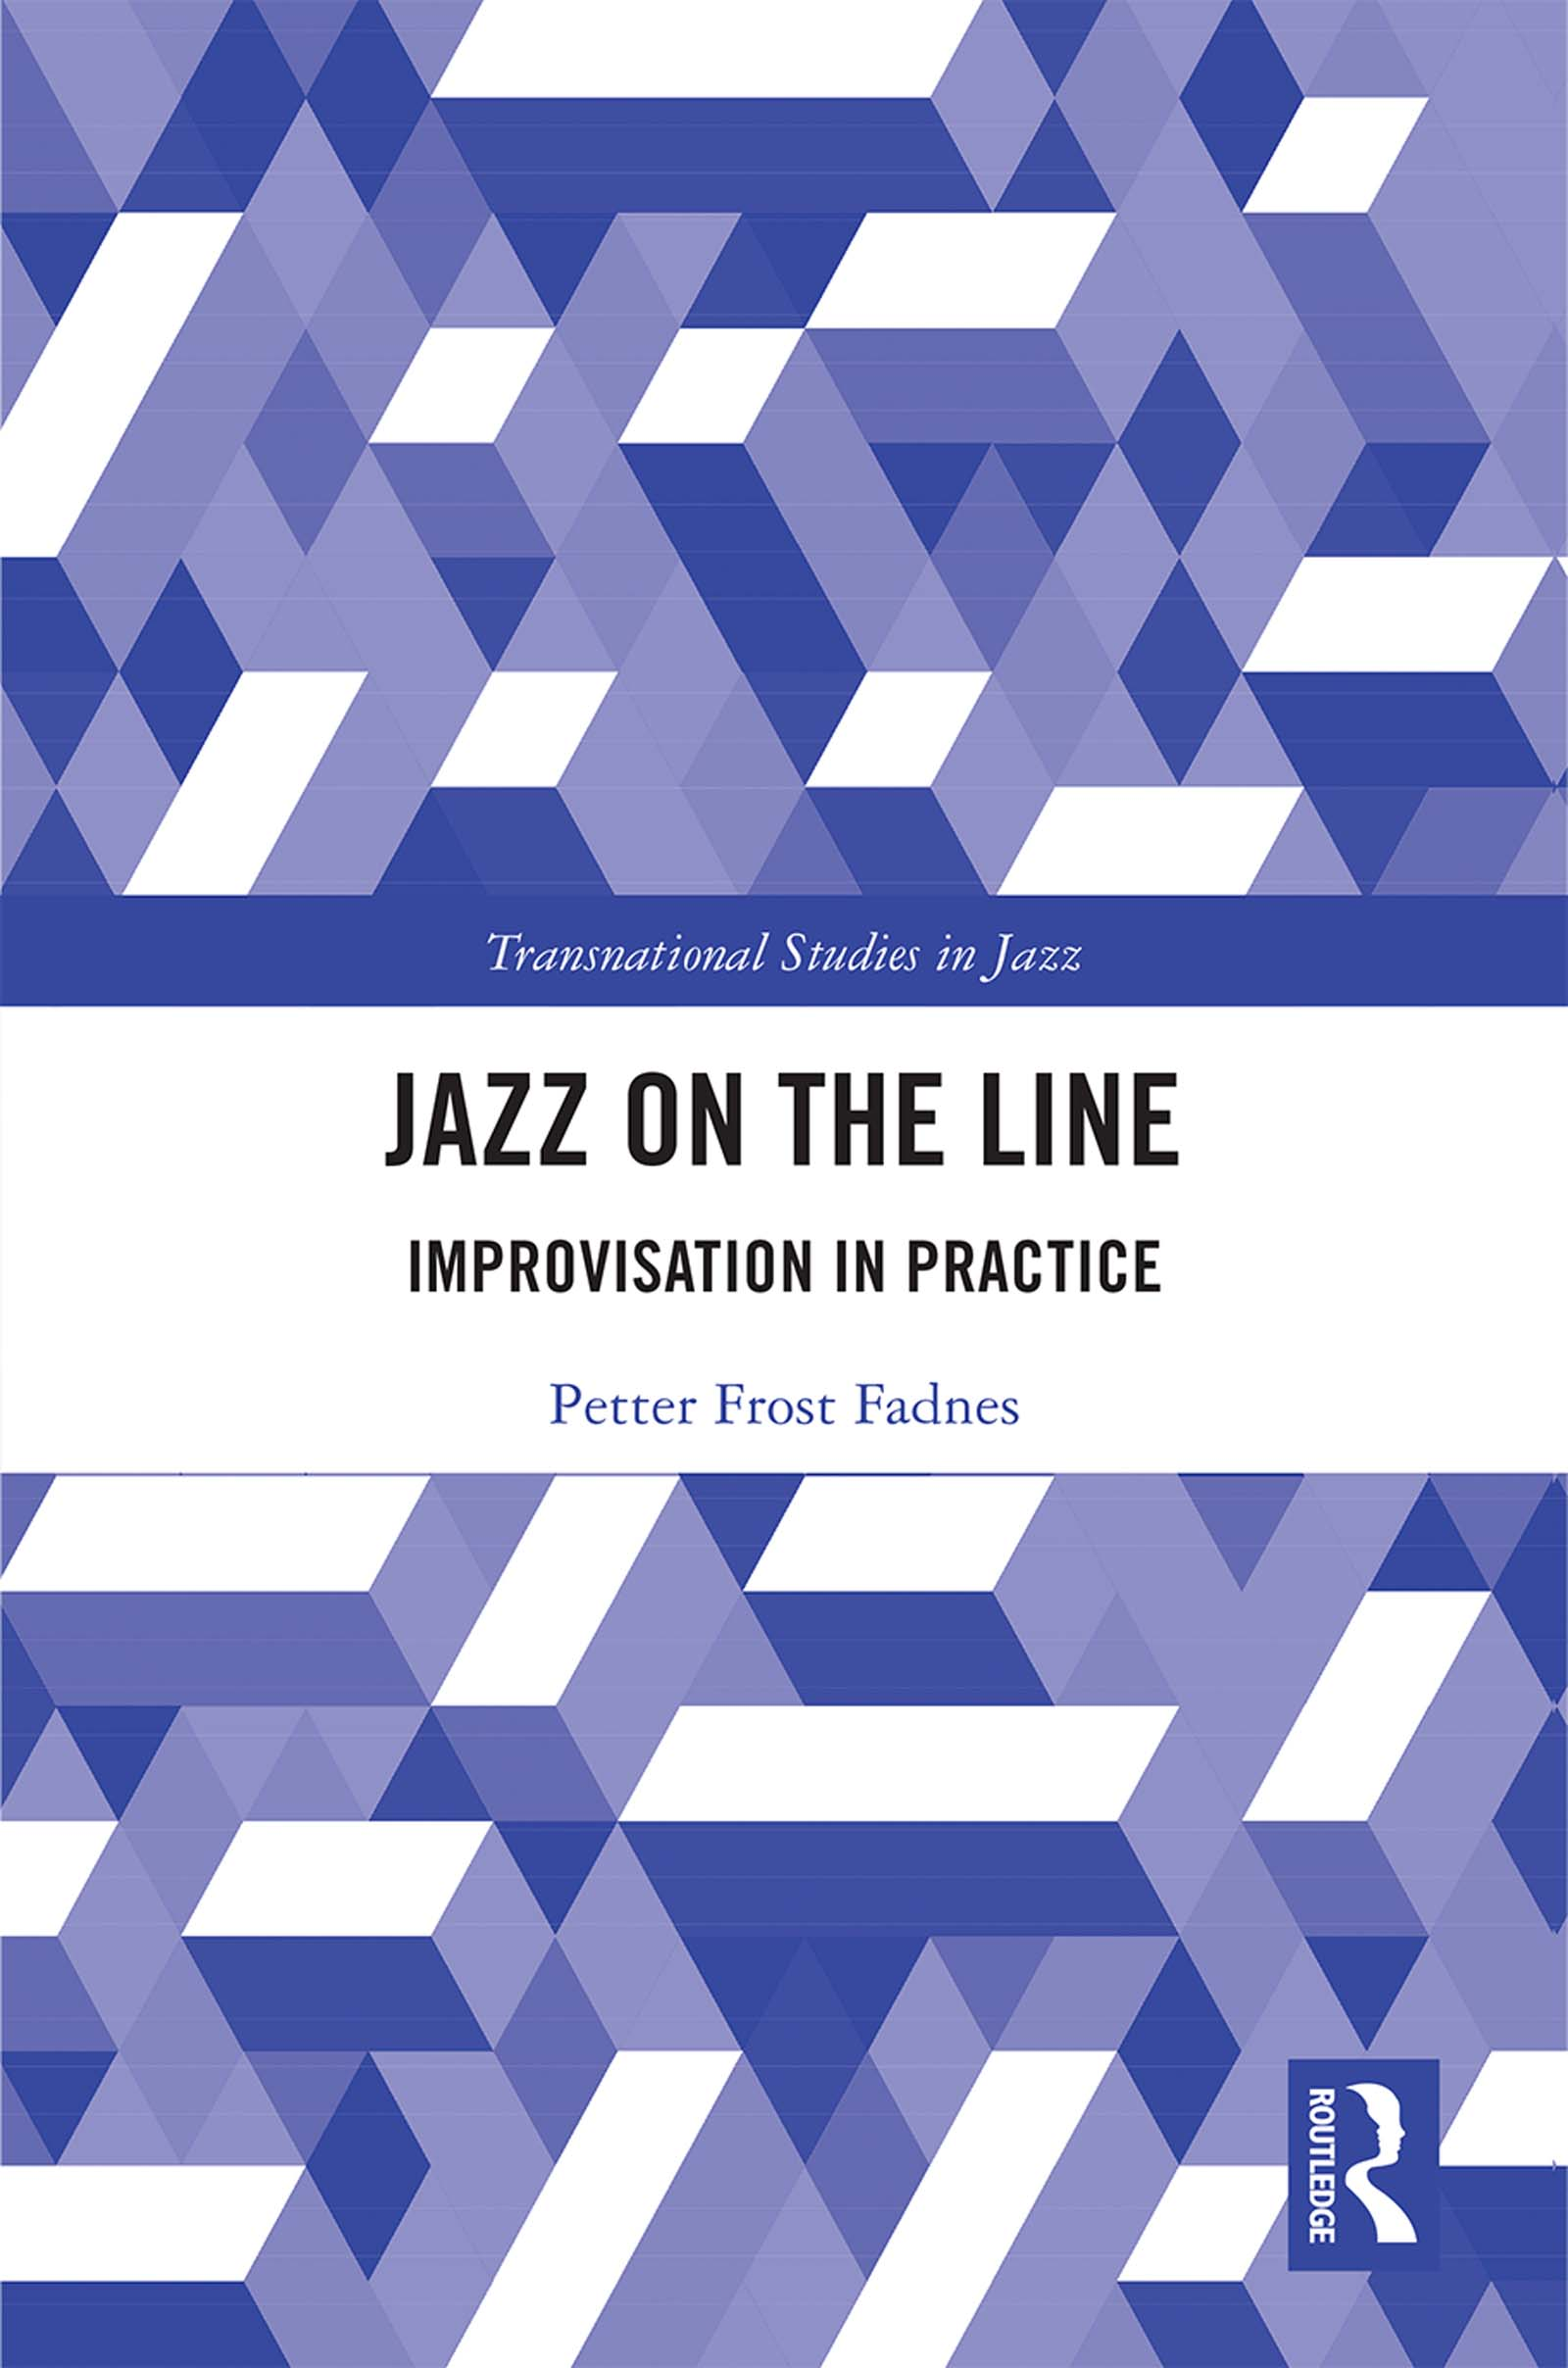 Jazz on the Line